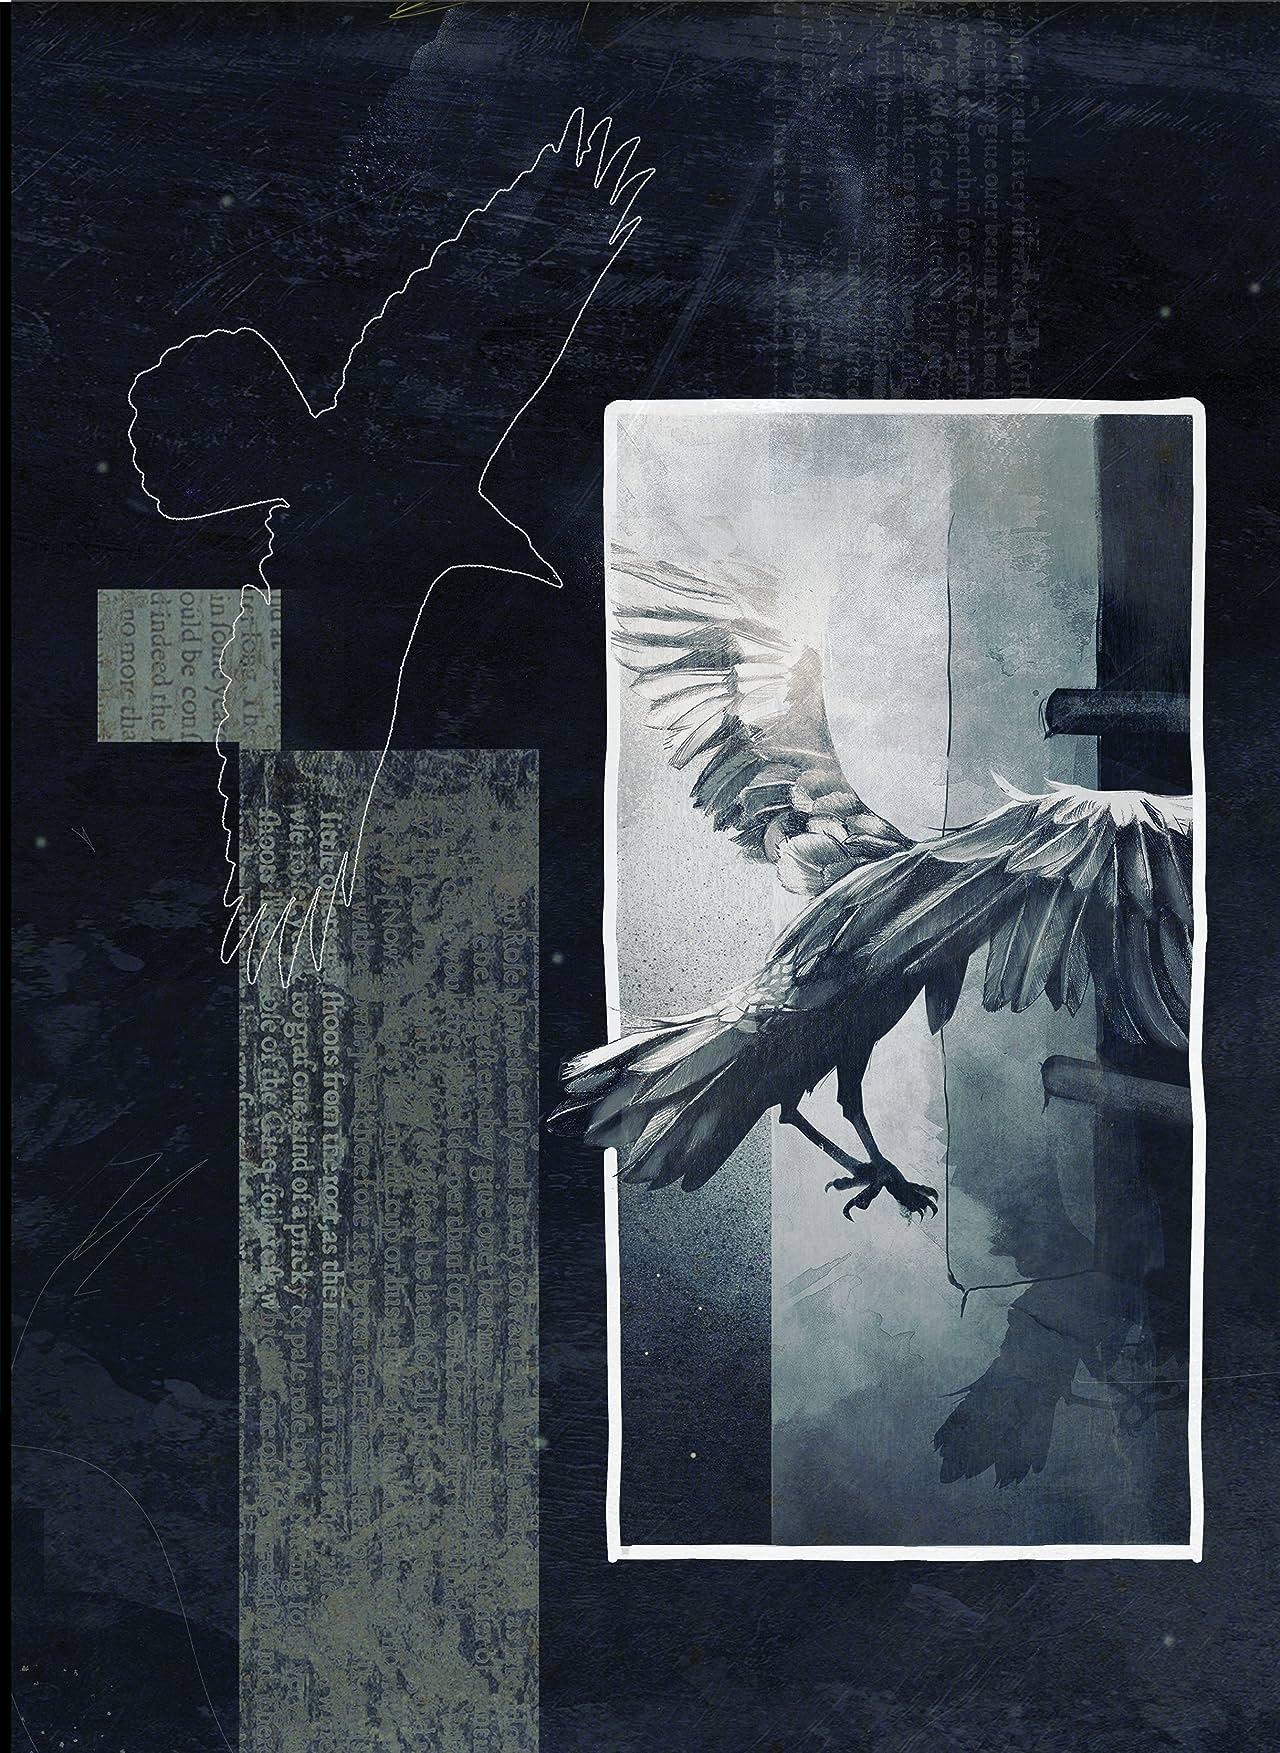 Edgar Allan Poe's The Black Cat